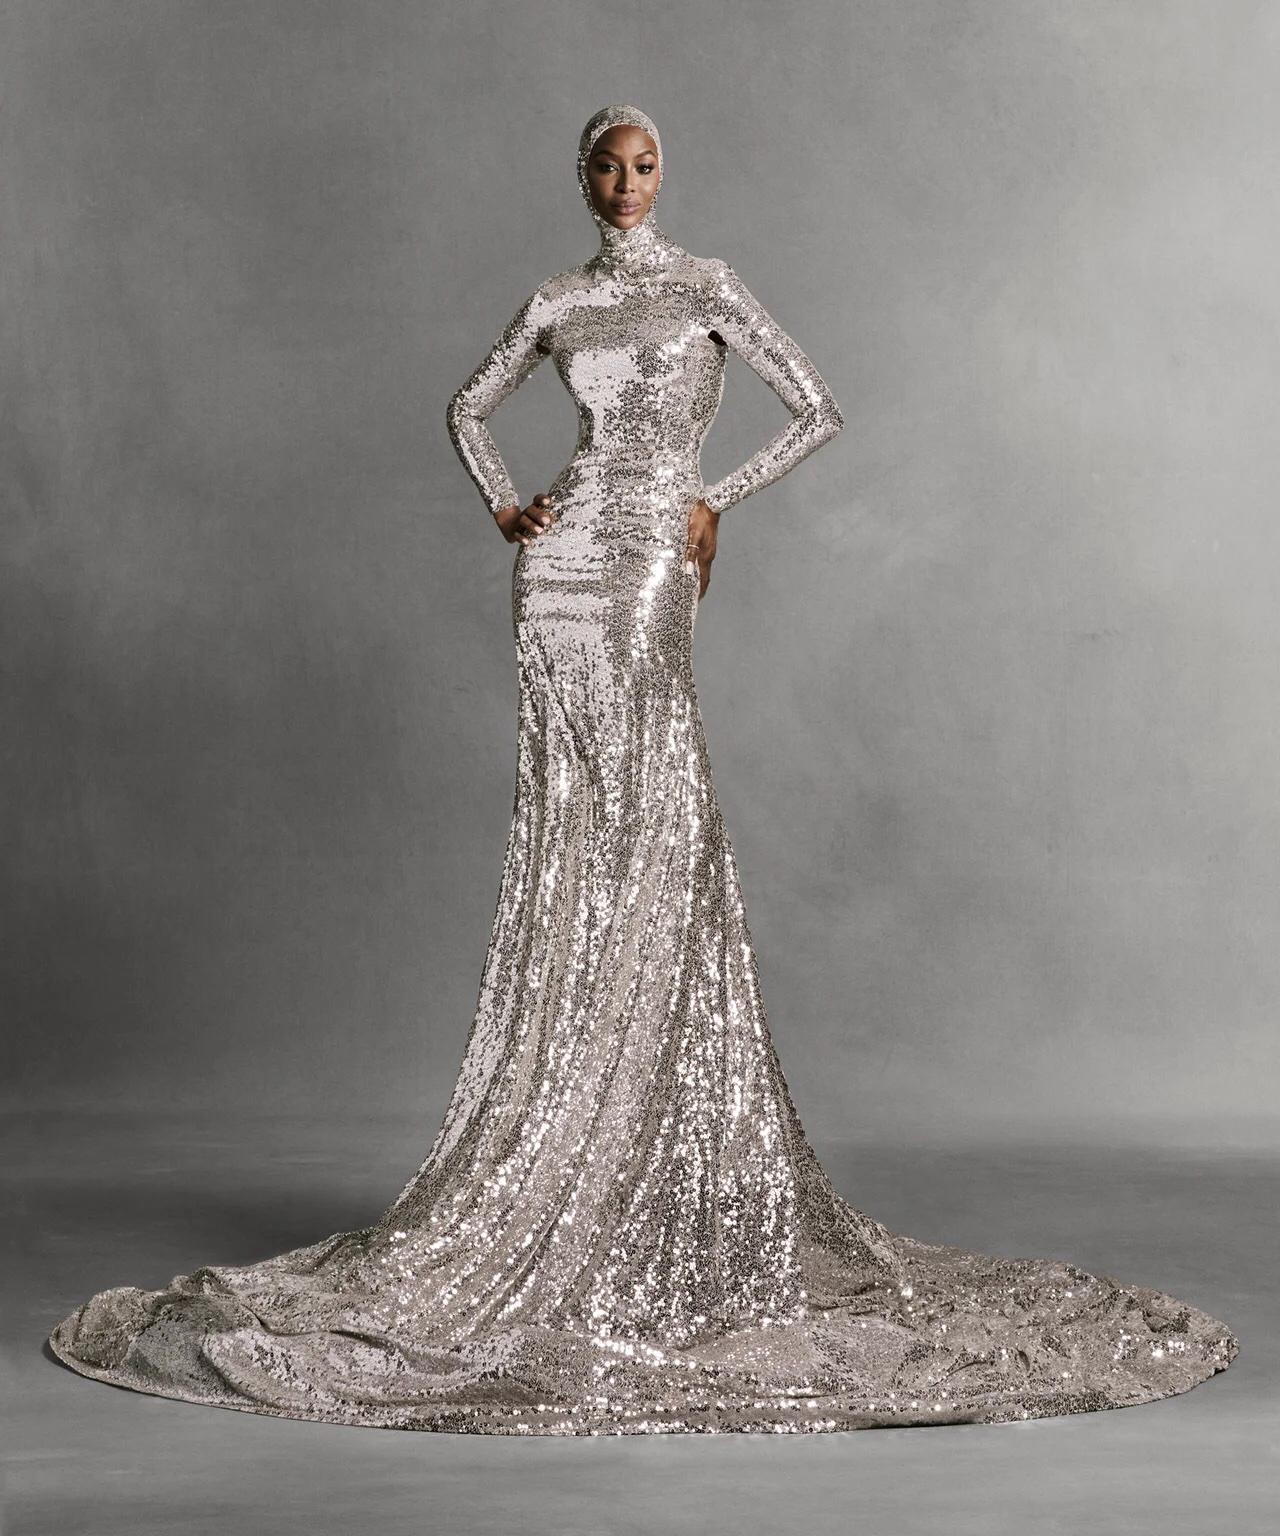 Naomi-Campbell-Vogue-magazine-November-issue